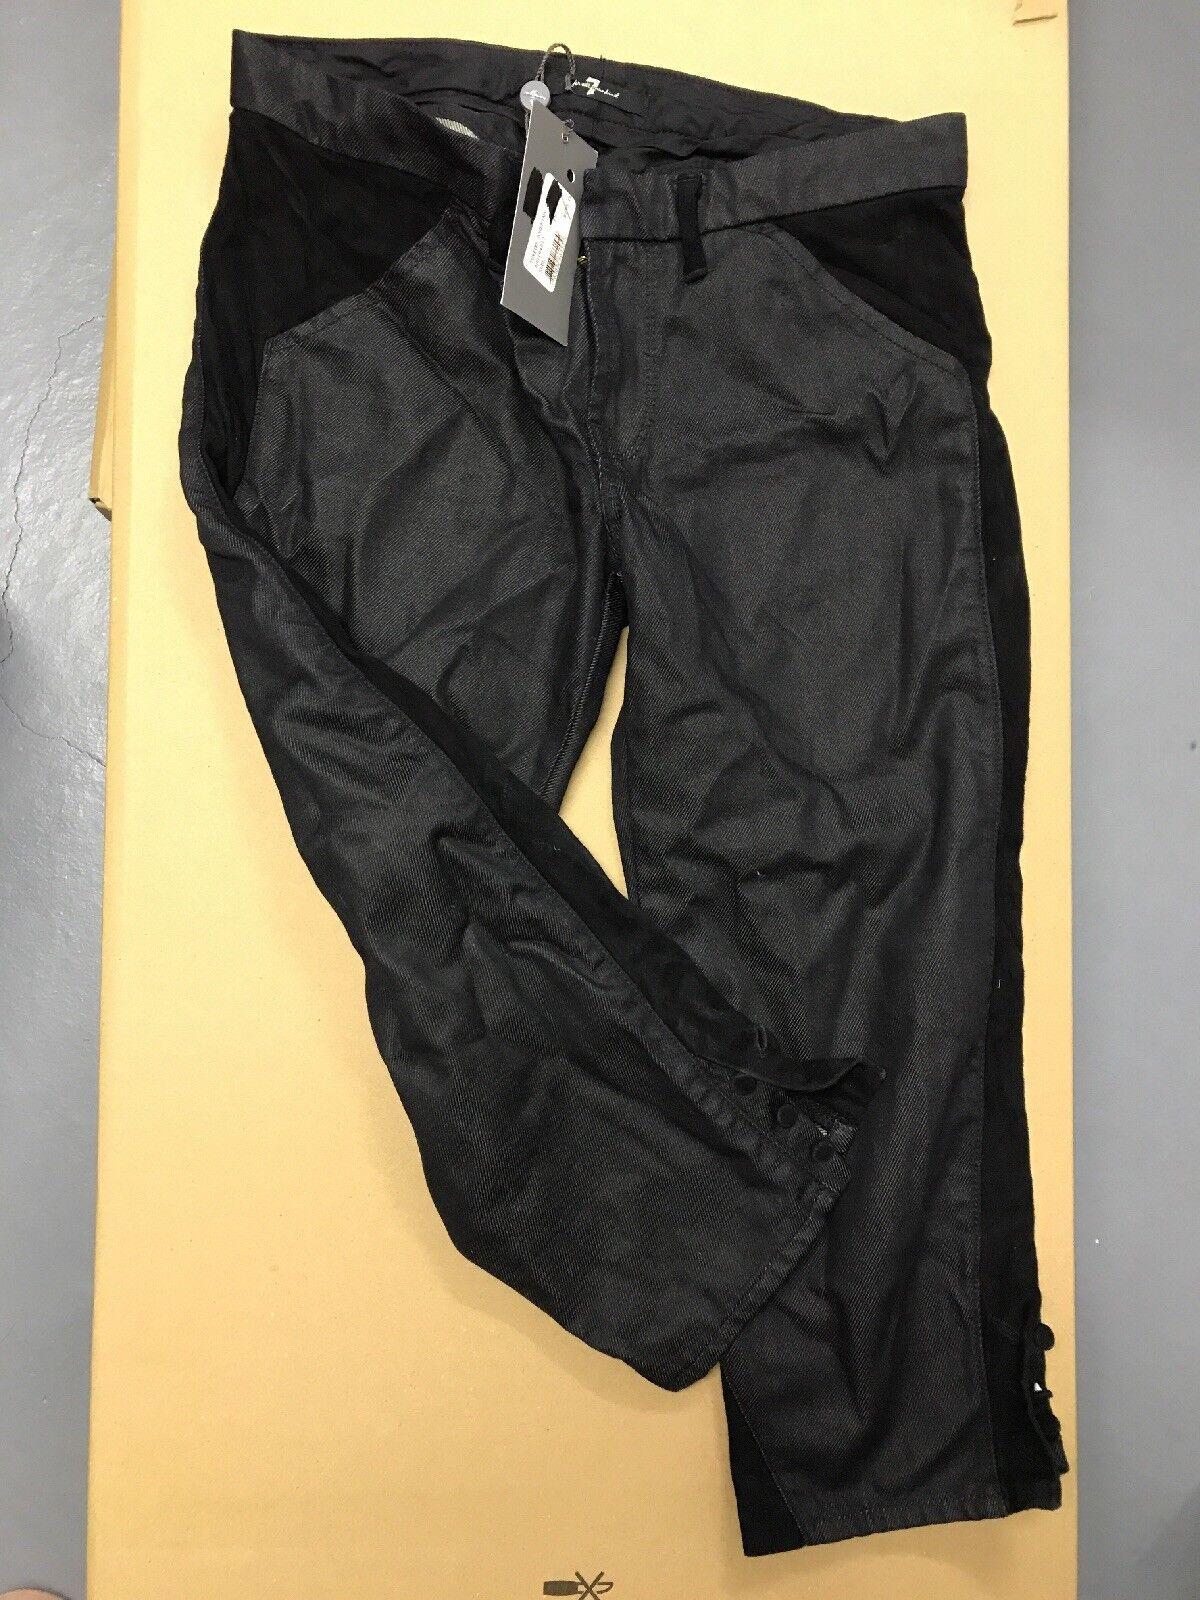 7 For All Mankind 25 Tuxedo Josefina Aus New York Mit Leder (36 ) 295 Dollar